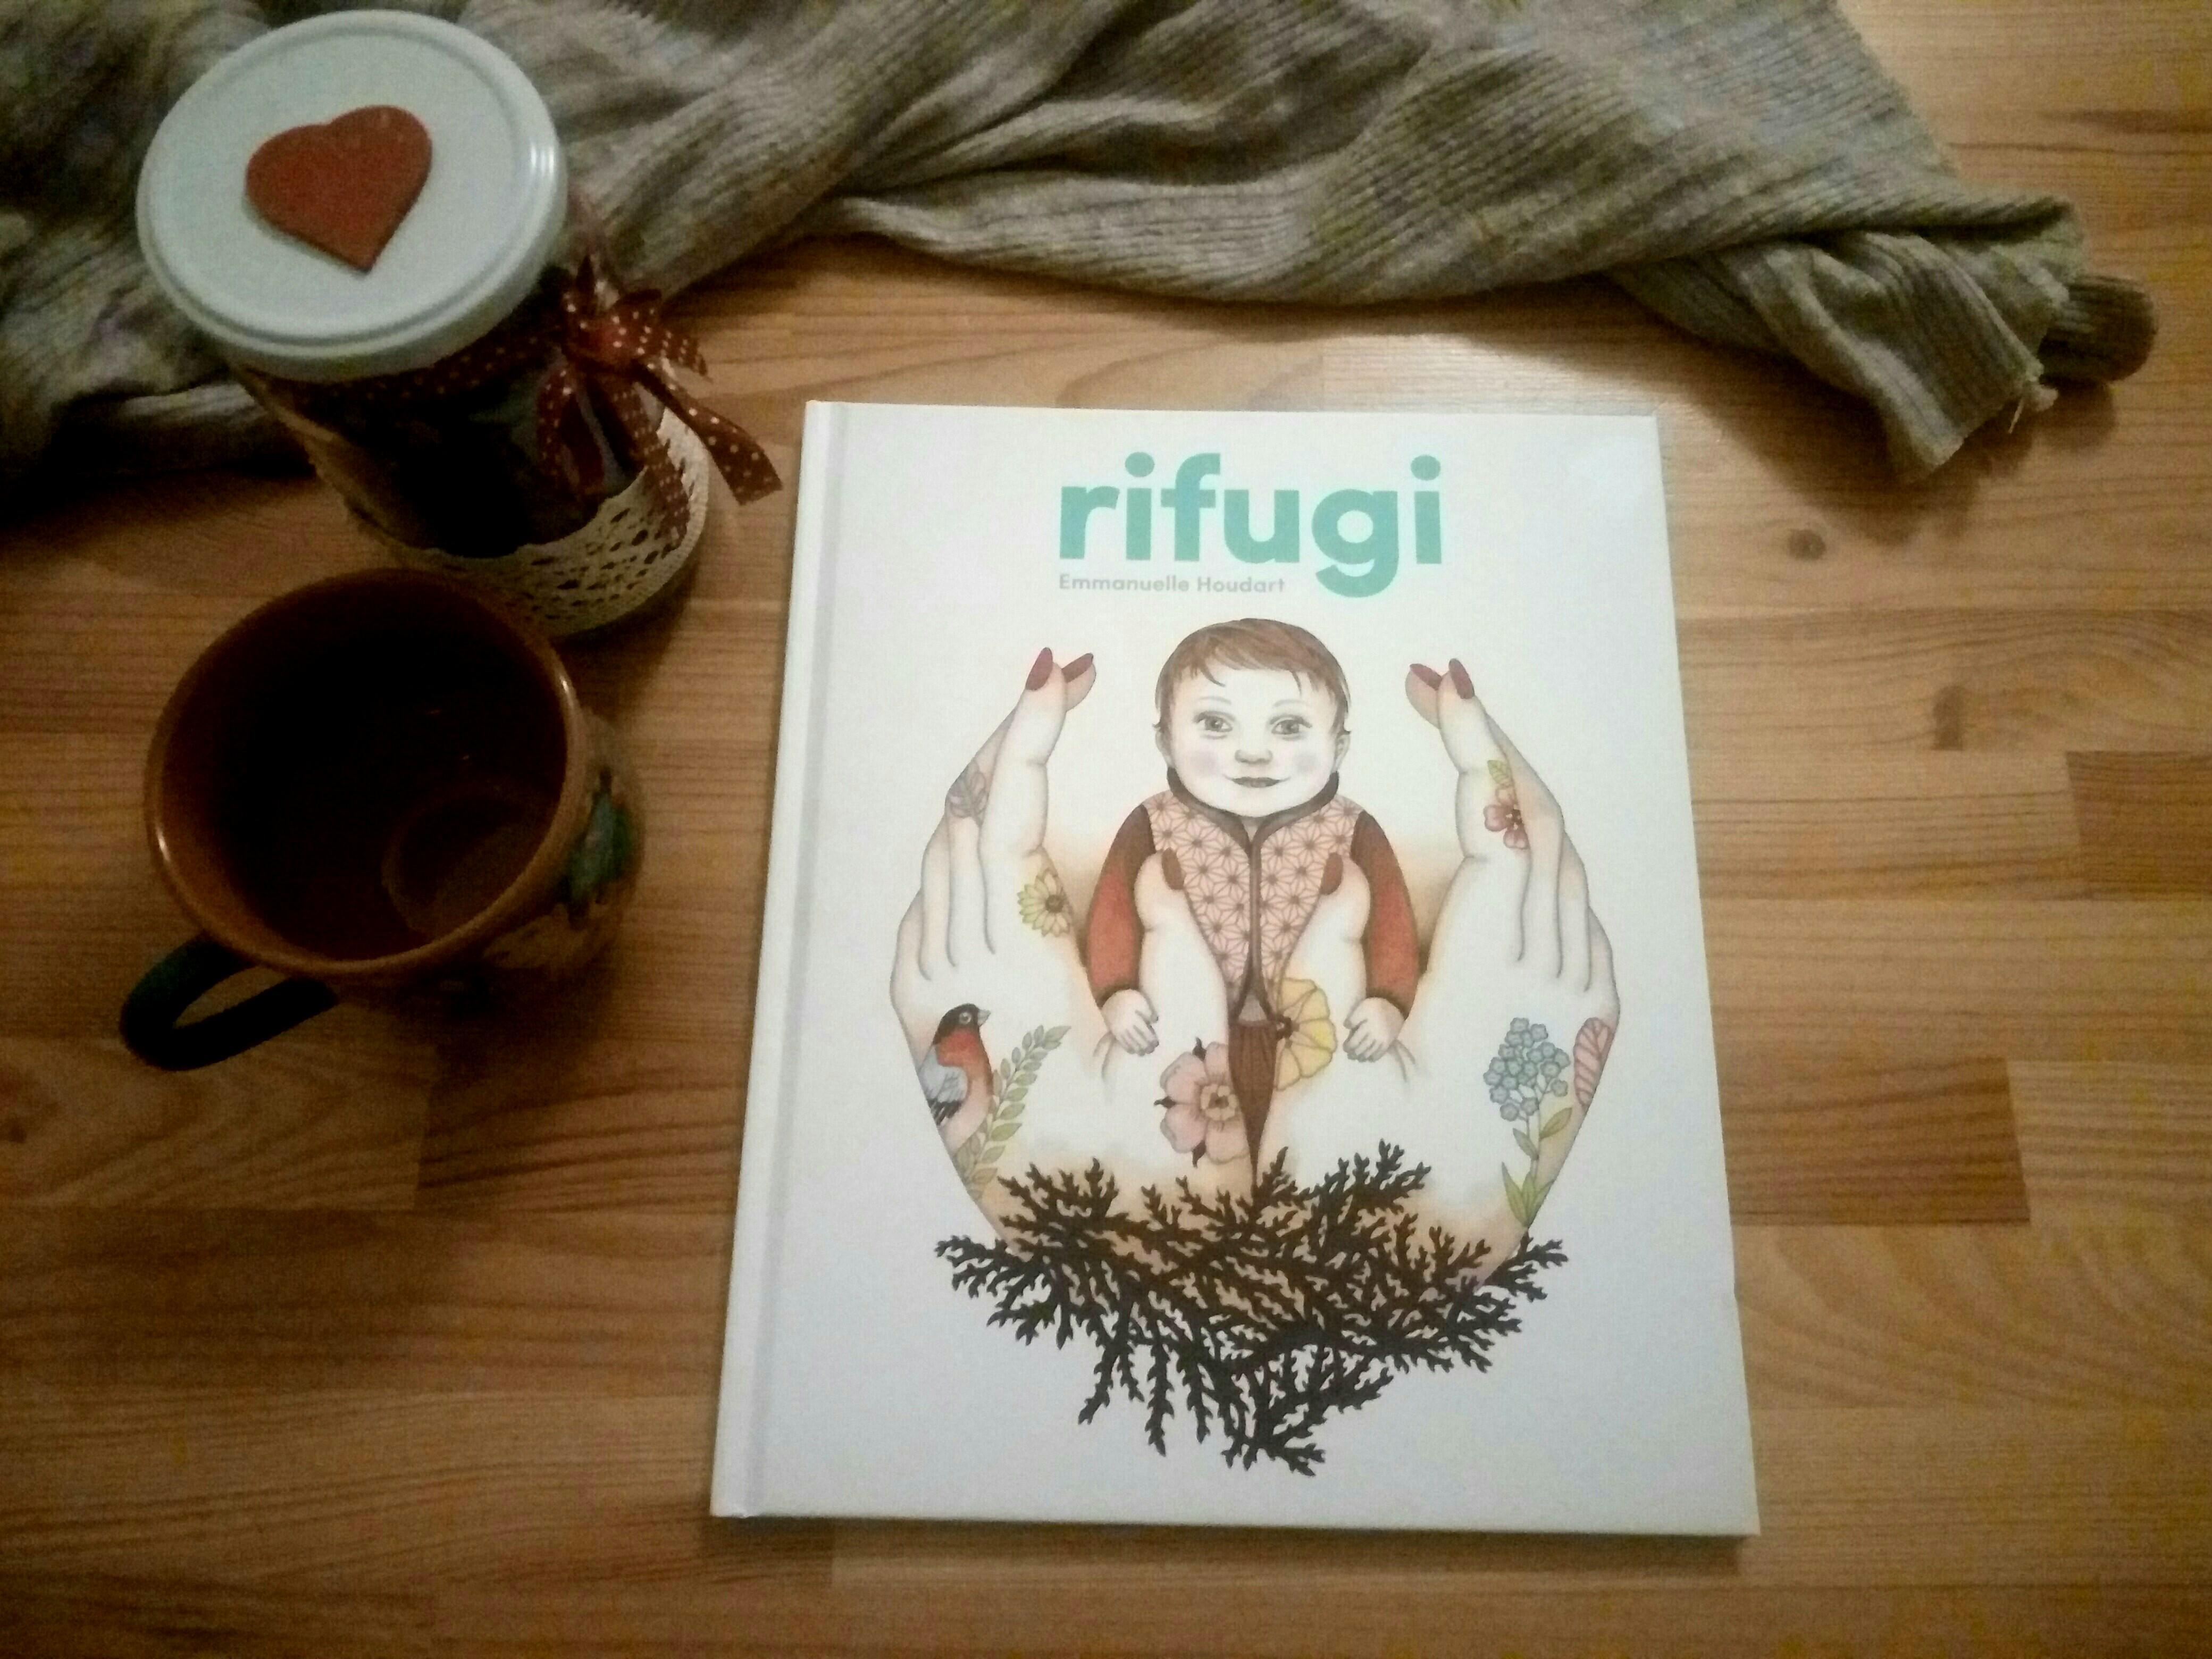 Rifugi - Houdart - Logos